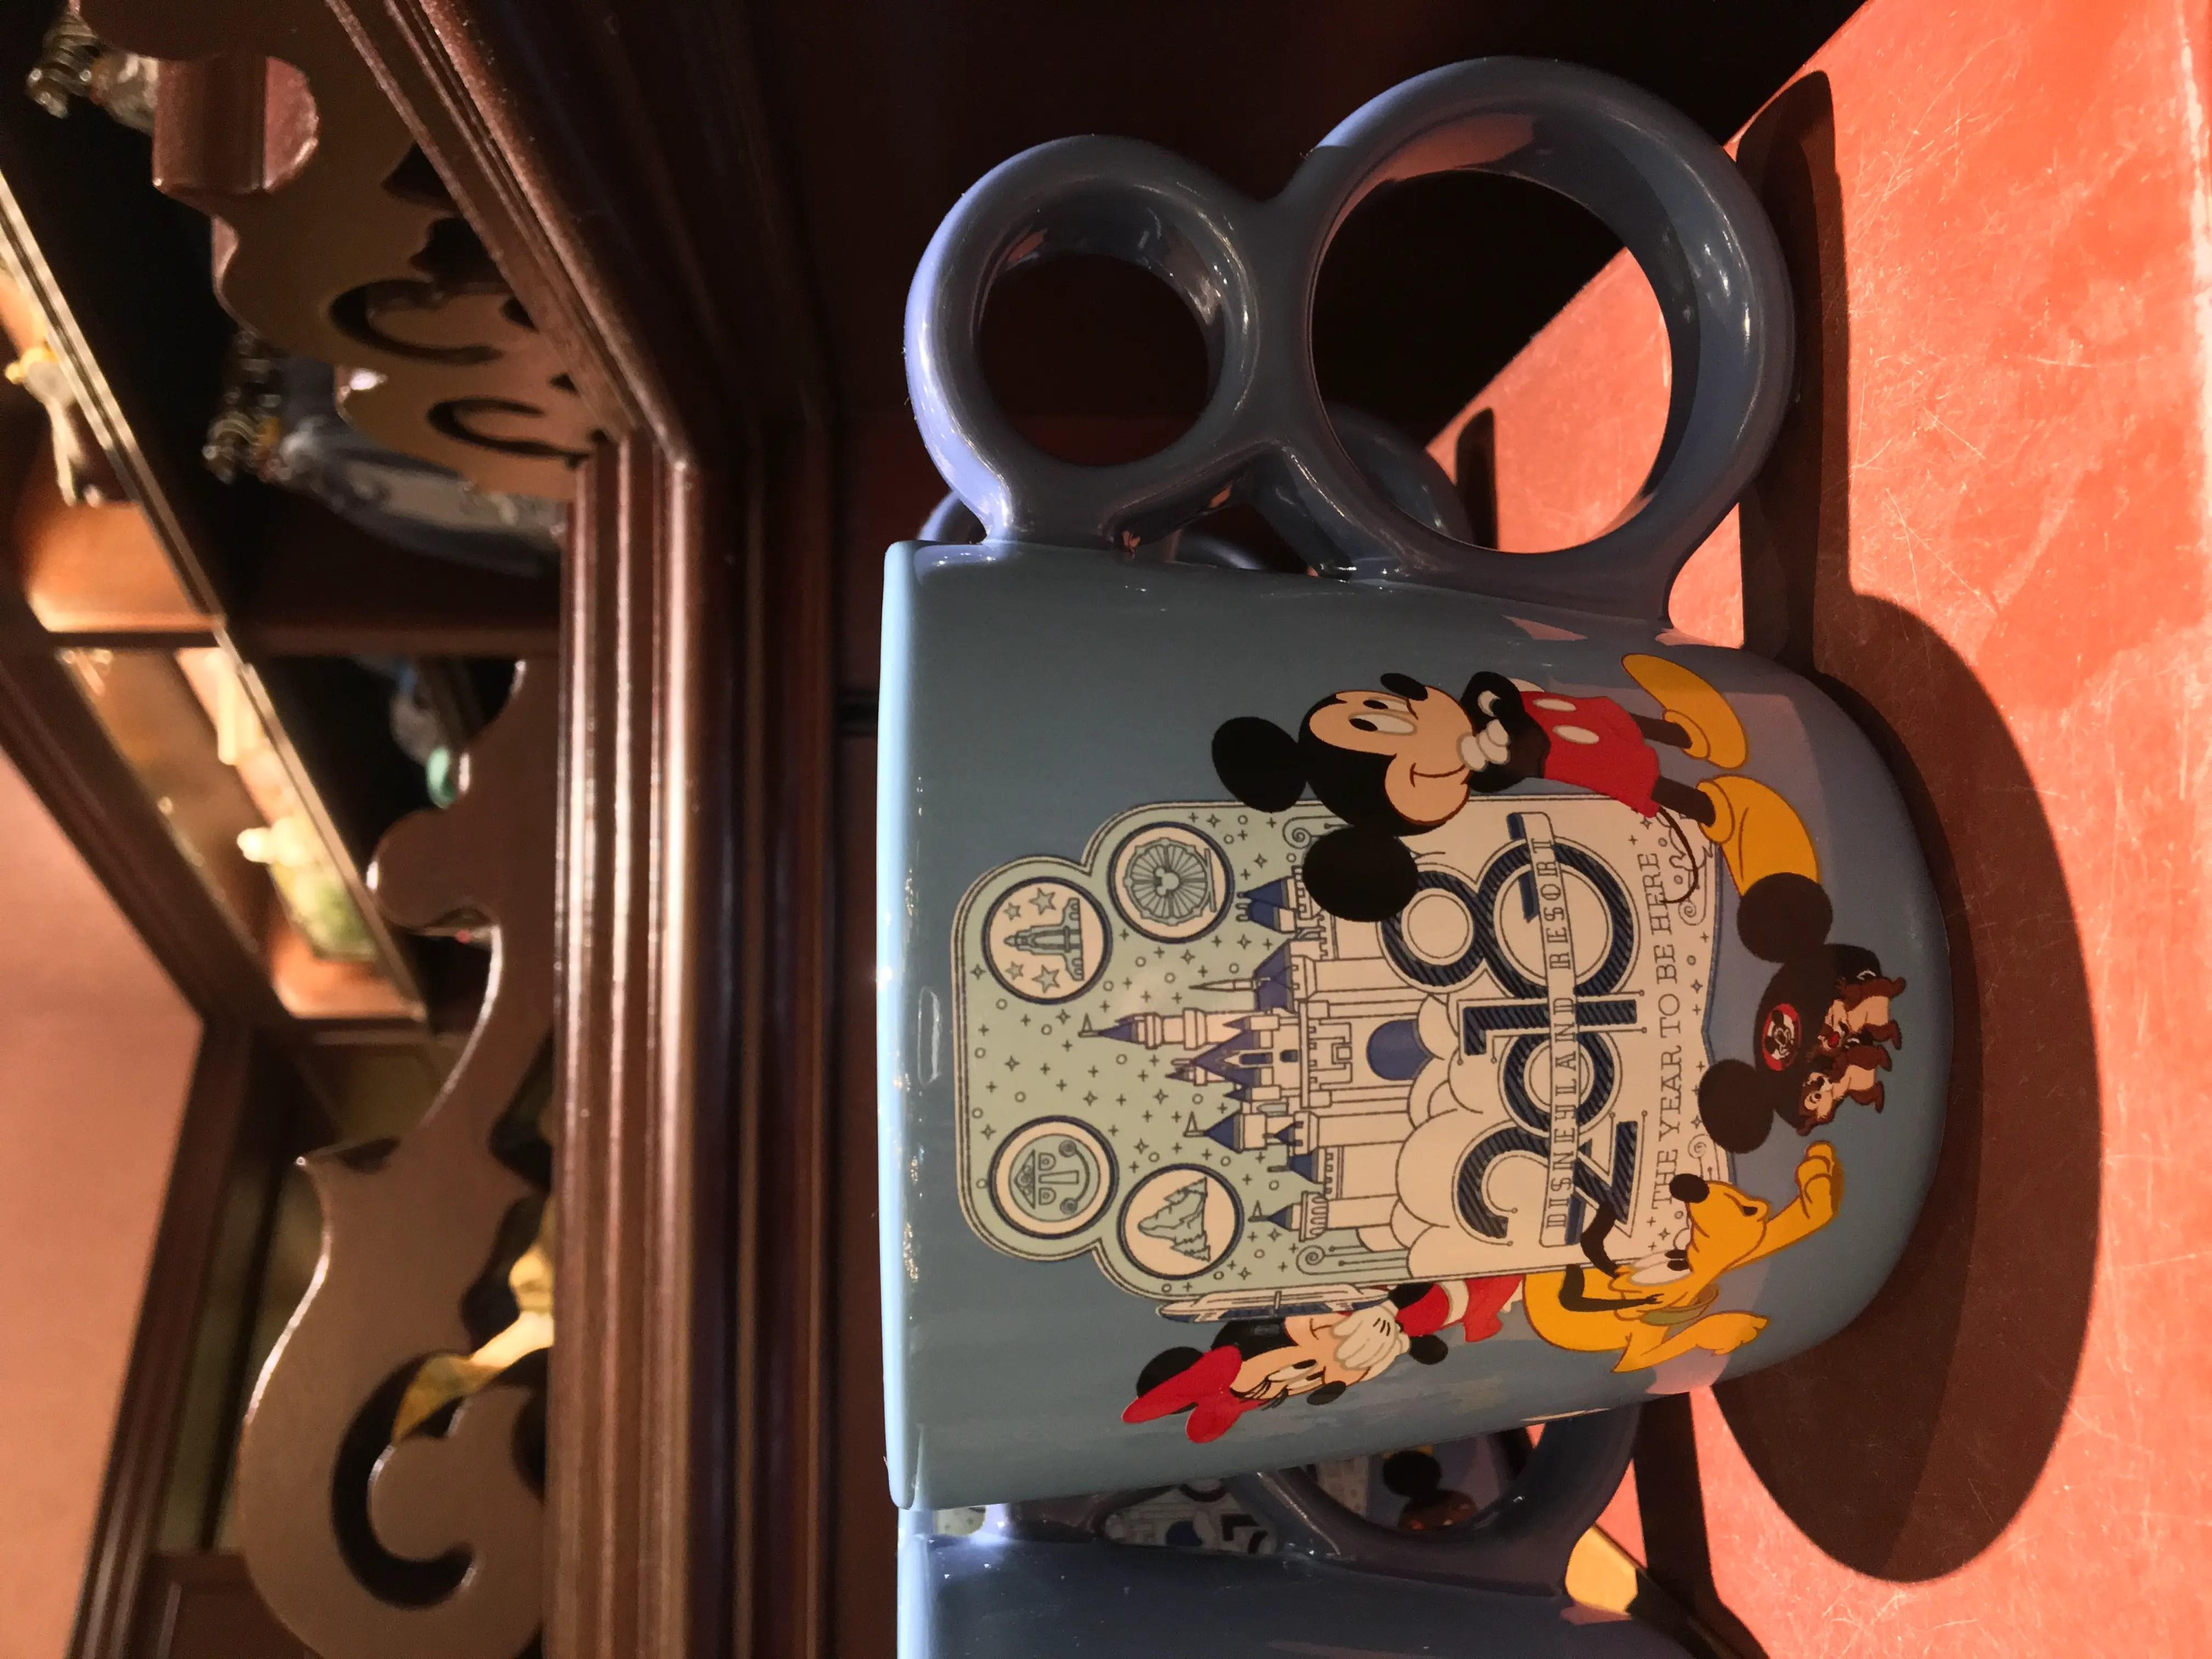 Caitlyn's Disney Merchandise Round-Up: 2018 Merchandise